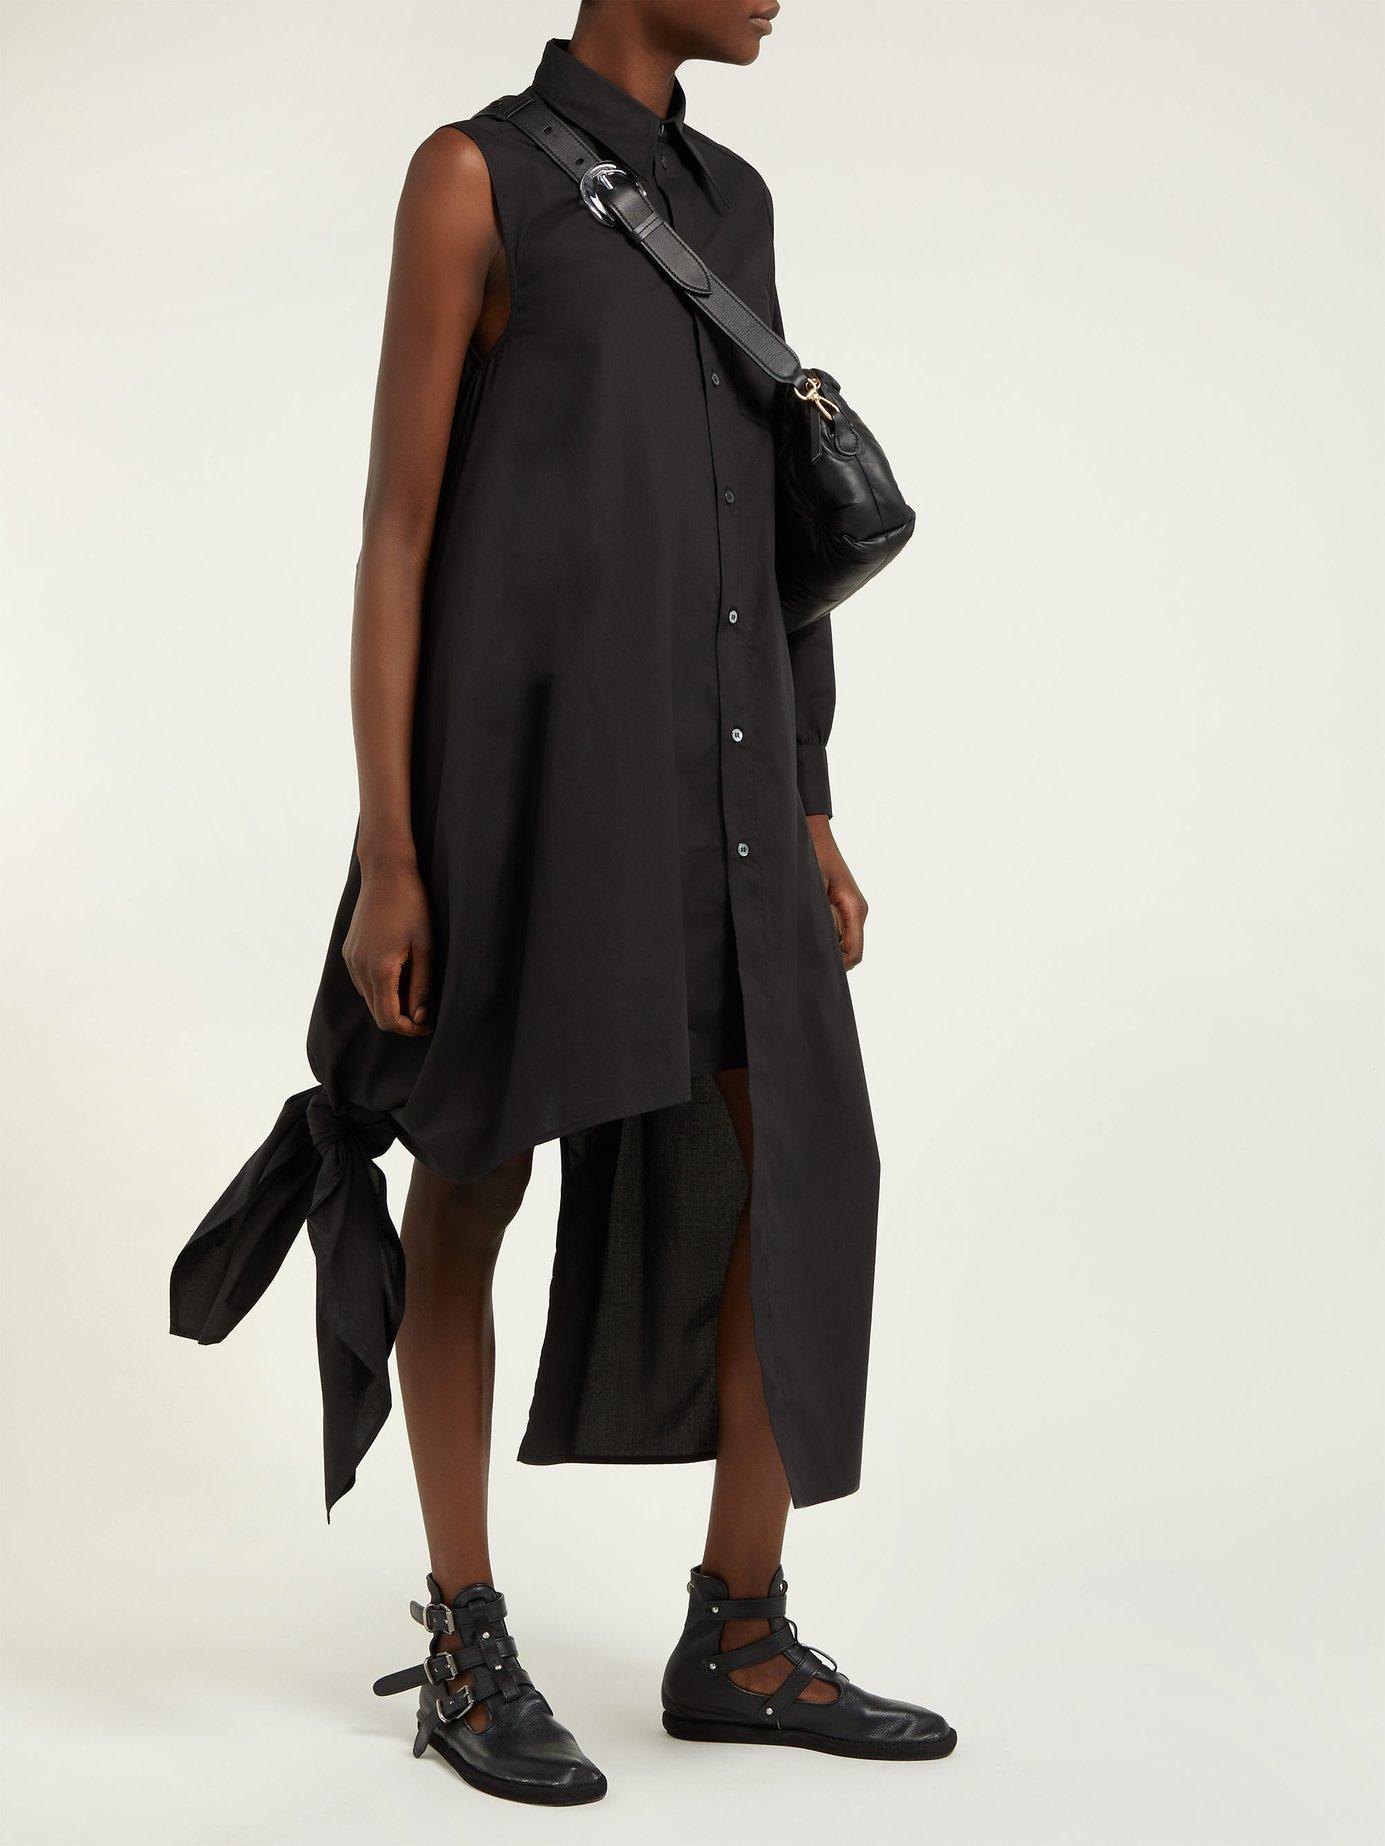 bc1df9e2dbb Lyst - MM6 by Maison Martin Margiela Asymmetrical Long Shirt Dress in Black